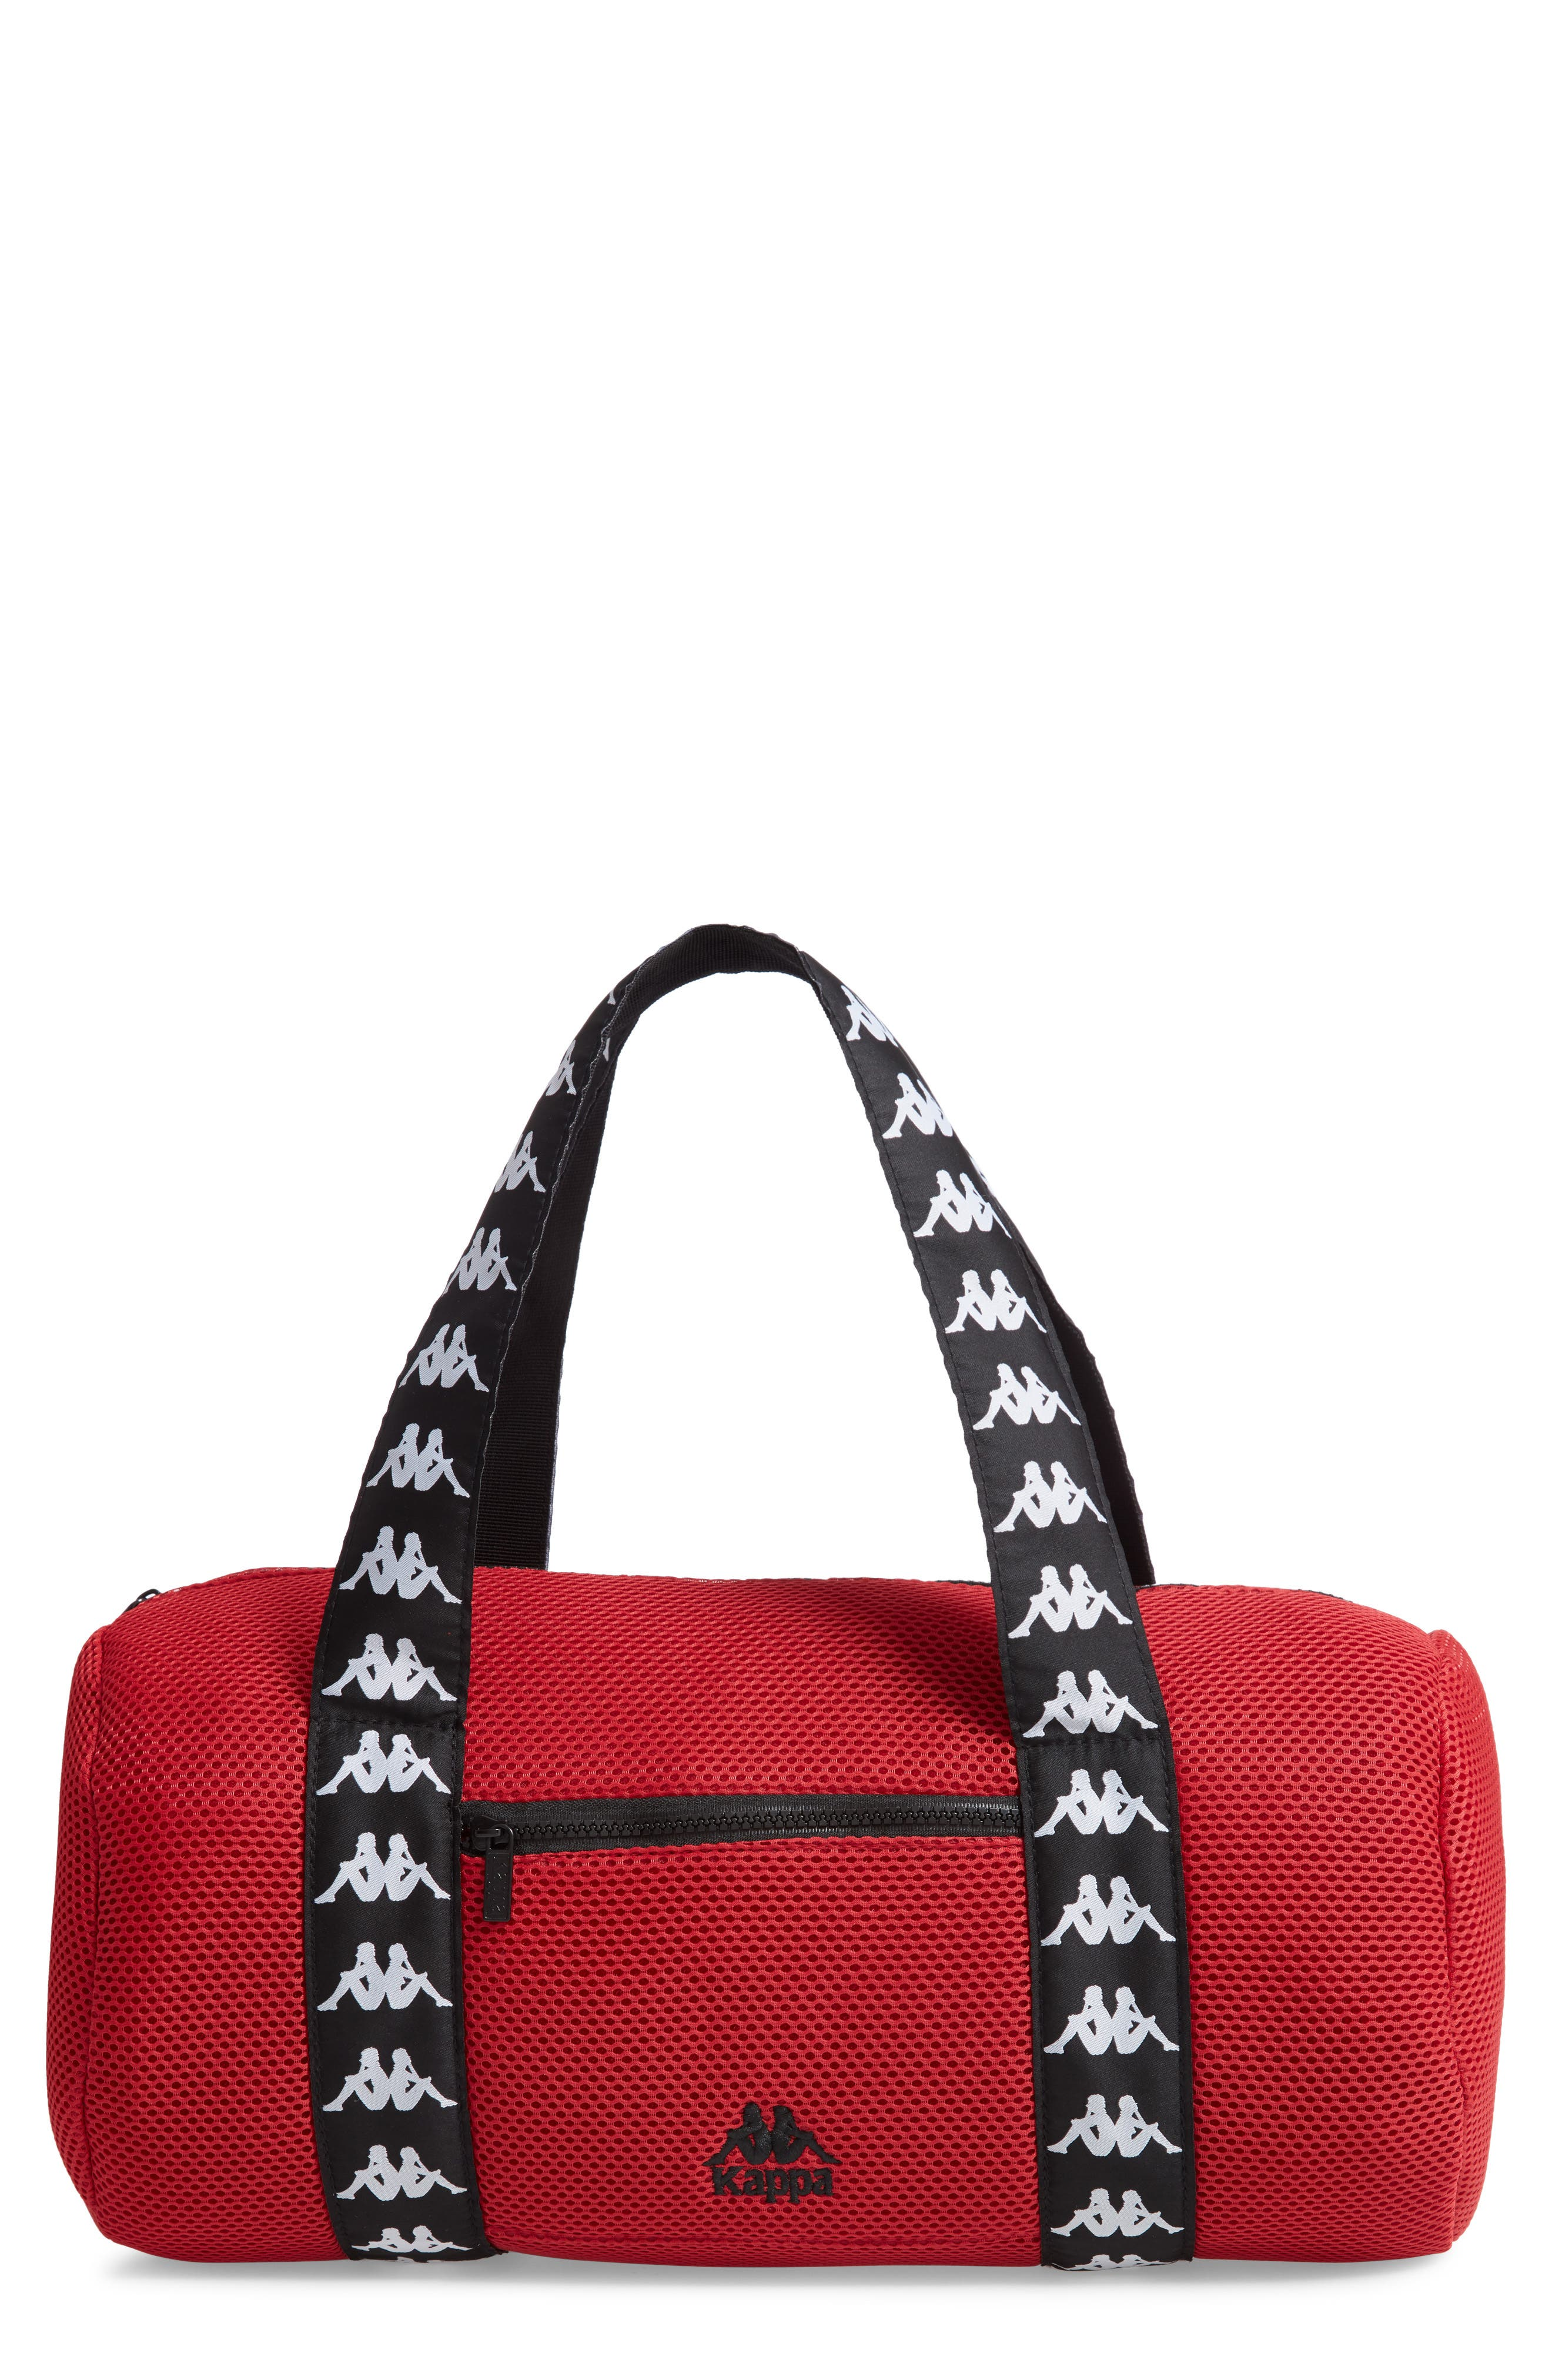 Large Mesh Athletic Duffel Bag,                             Main thumbnail 1, color,                             RED DK-BLACK-WHITE